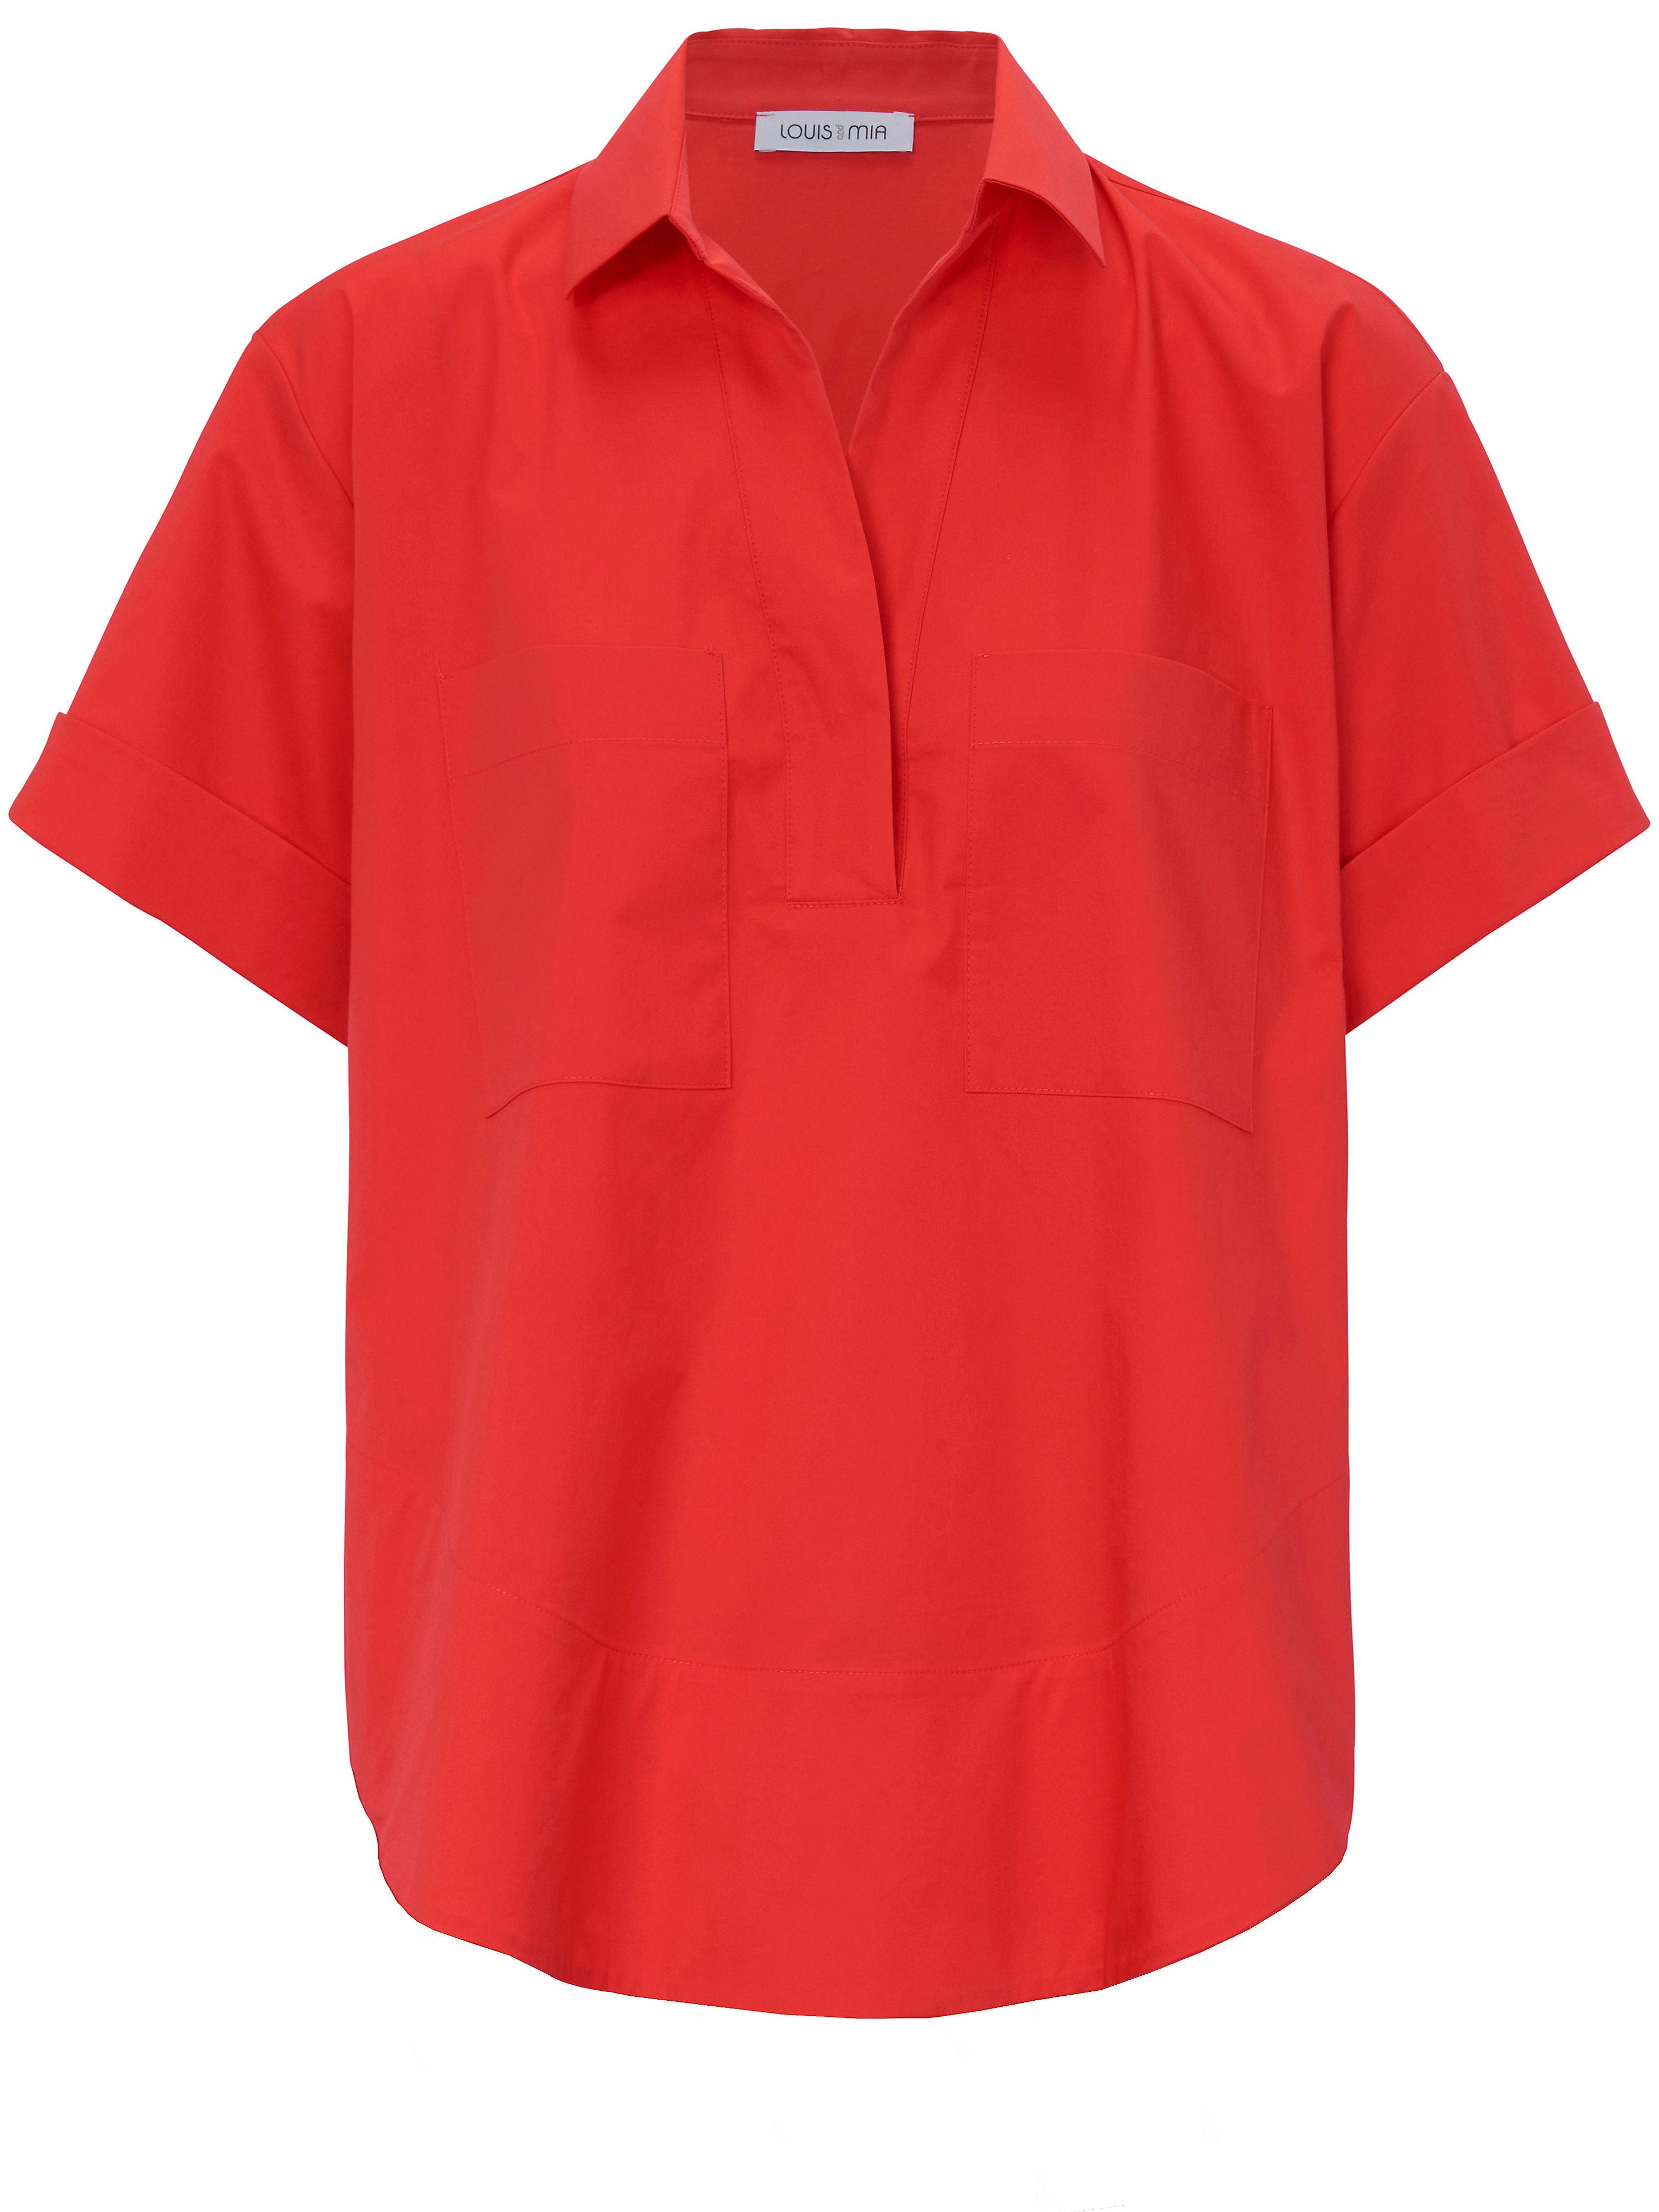 La blouse manches courtes  Louis and Mia rouge taille 46